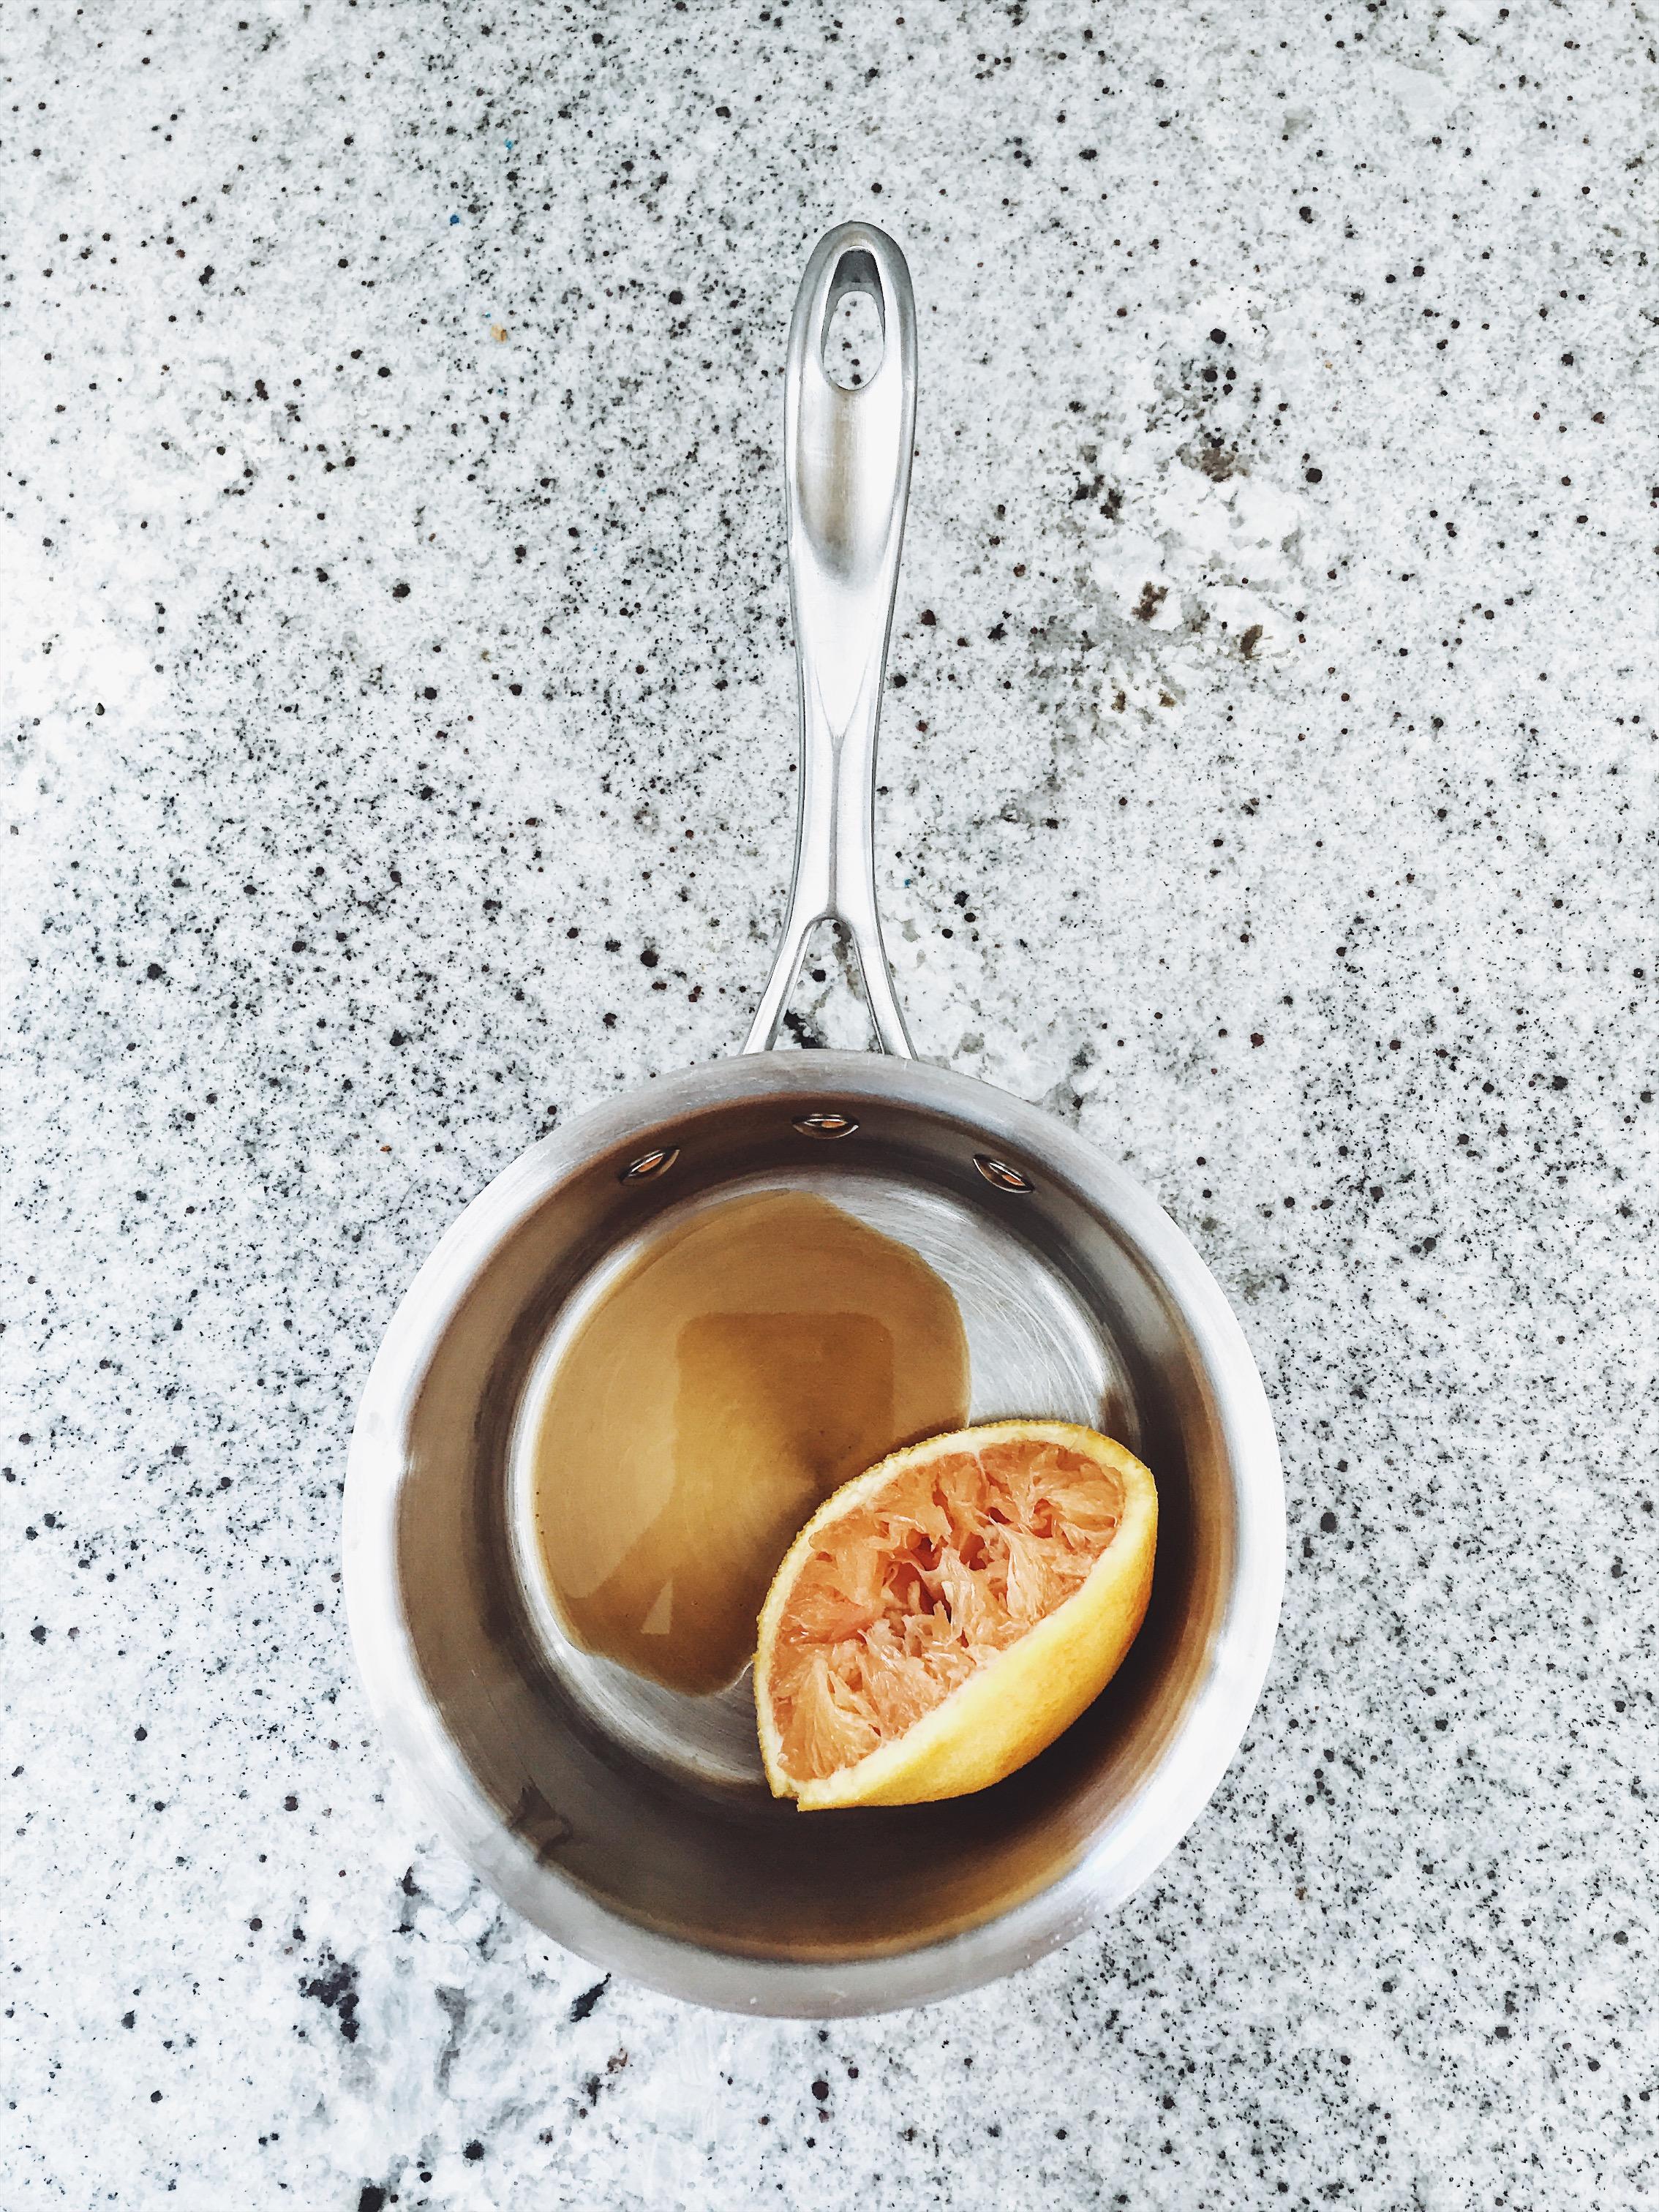 Wasteless Wednesday | Citrus + Vanilla Air Freshener | Set the Table #wastelesswednesday #setthetableblog #diy #airfreshener #citrusscraps